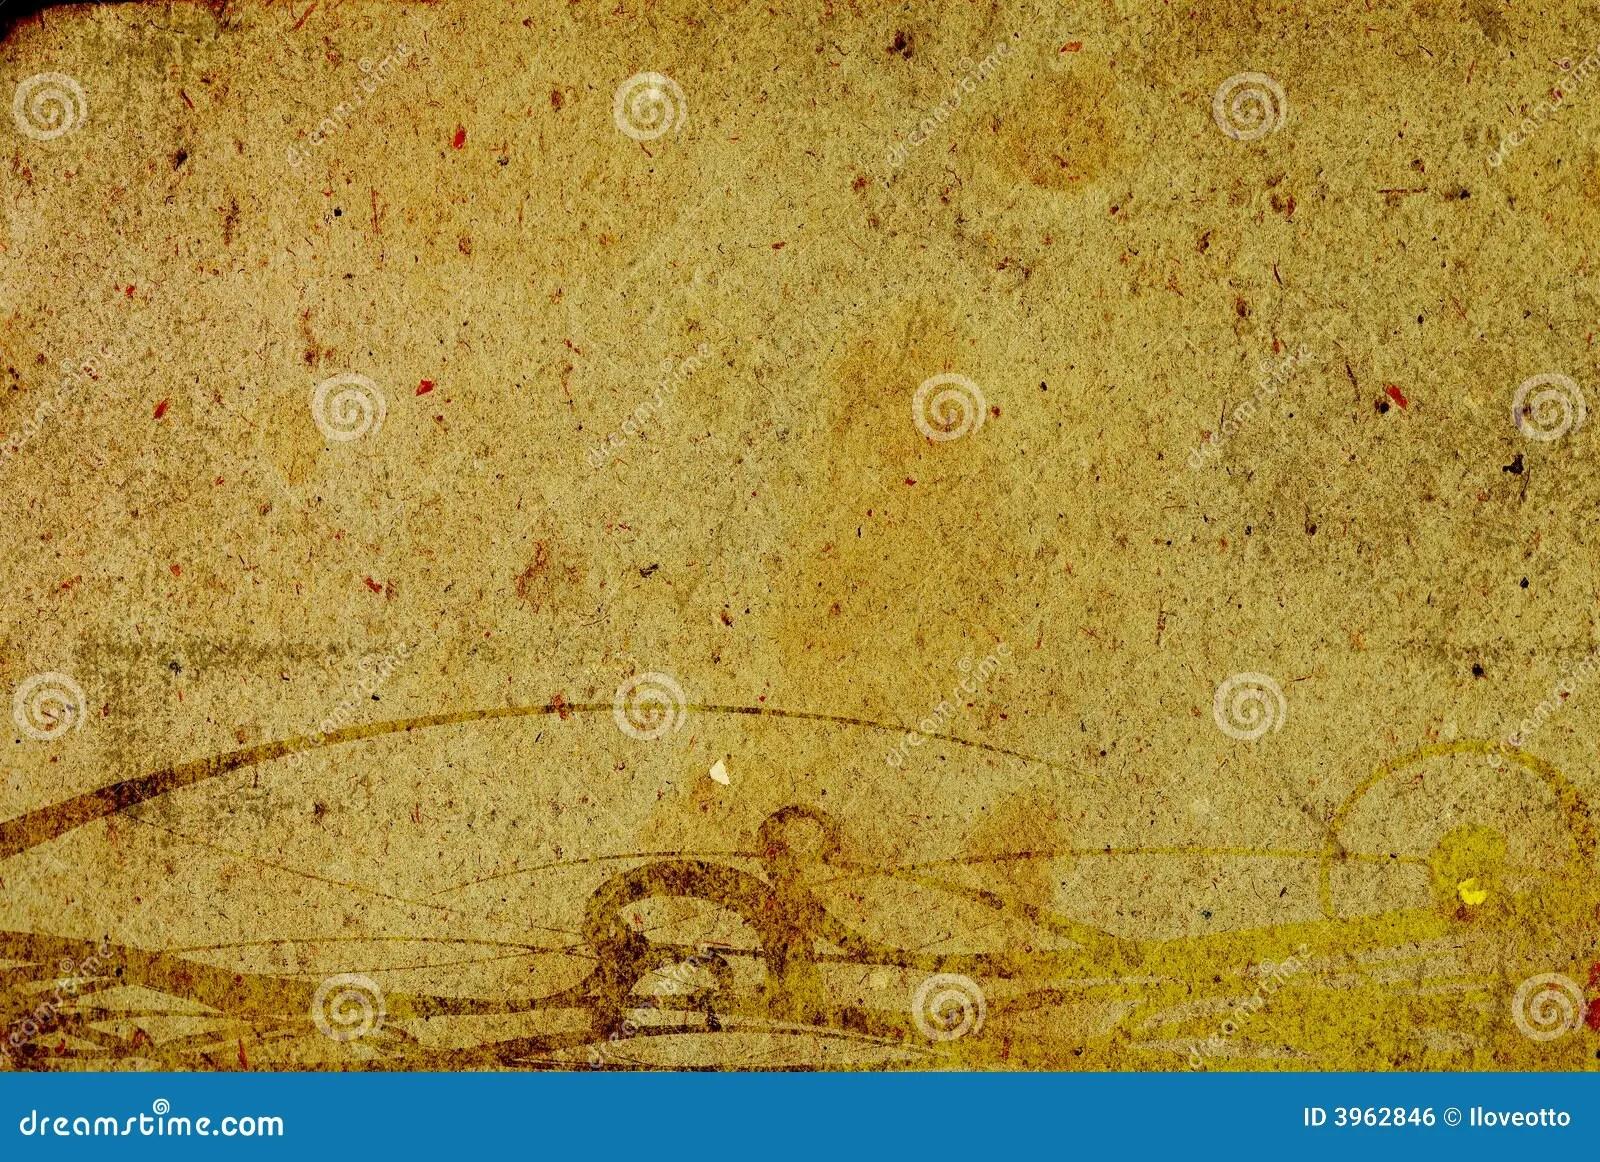 Antieke achtergrond stock illustratie Illustratie